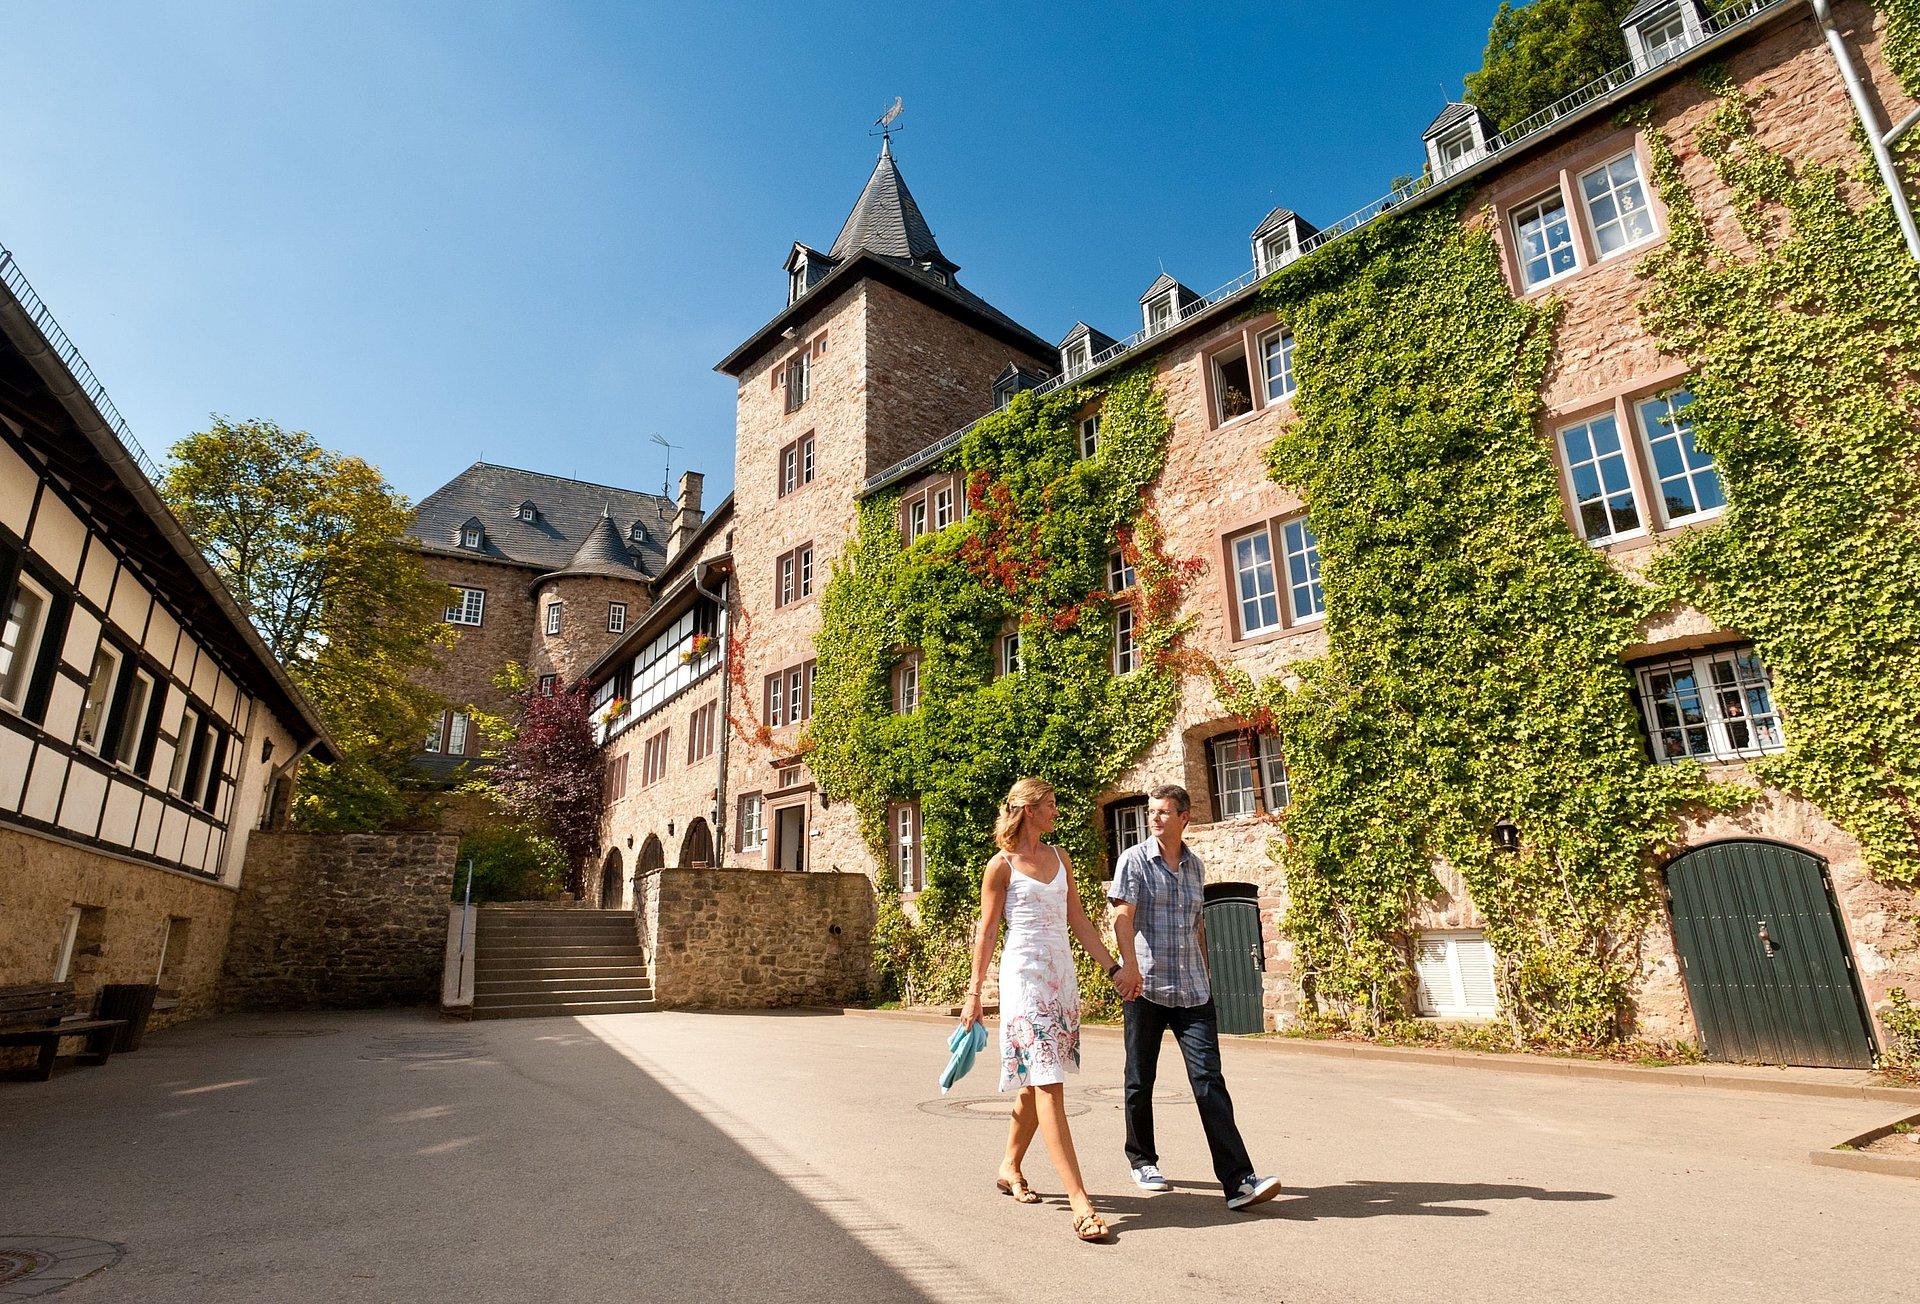 Spaziergang vorbei an der Burg Blankenheim, Eifel